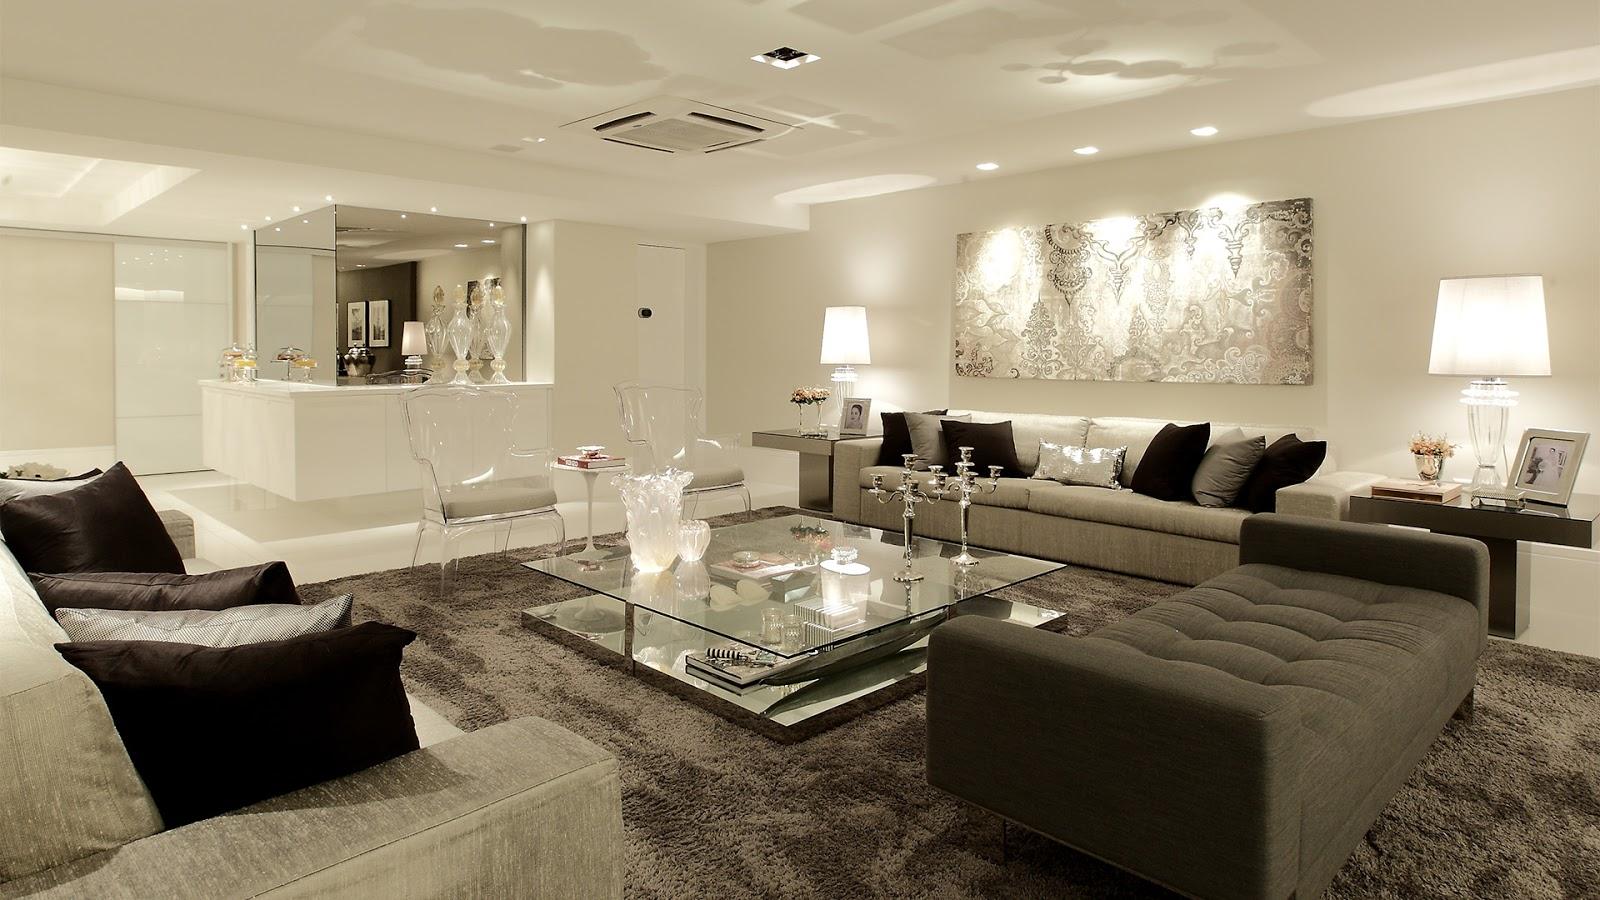 Construindo Minha Casa Clean Consultoria Da Leitora Sala De Estar  -> Fotos De Salas De Tv